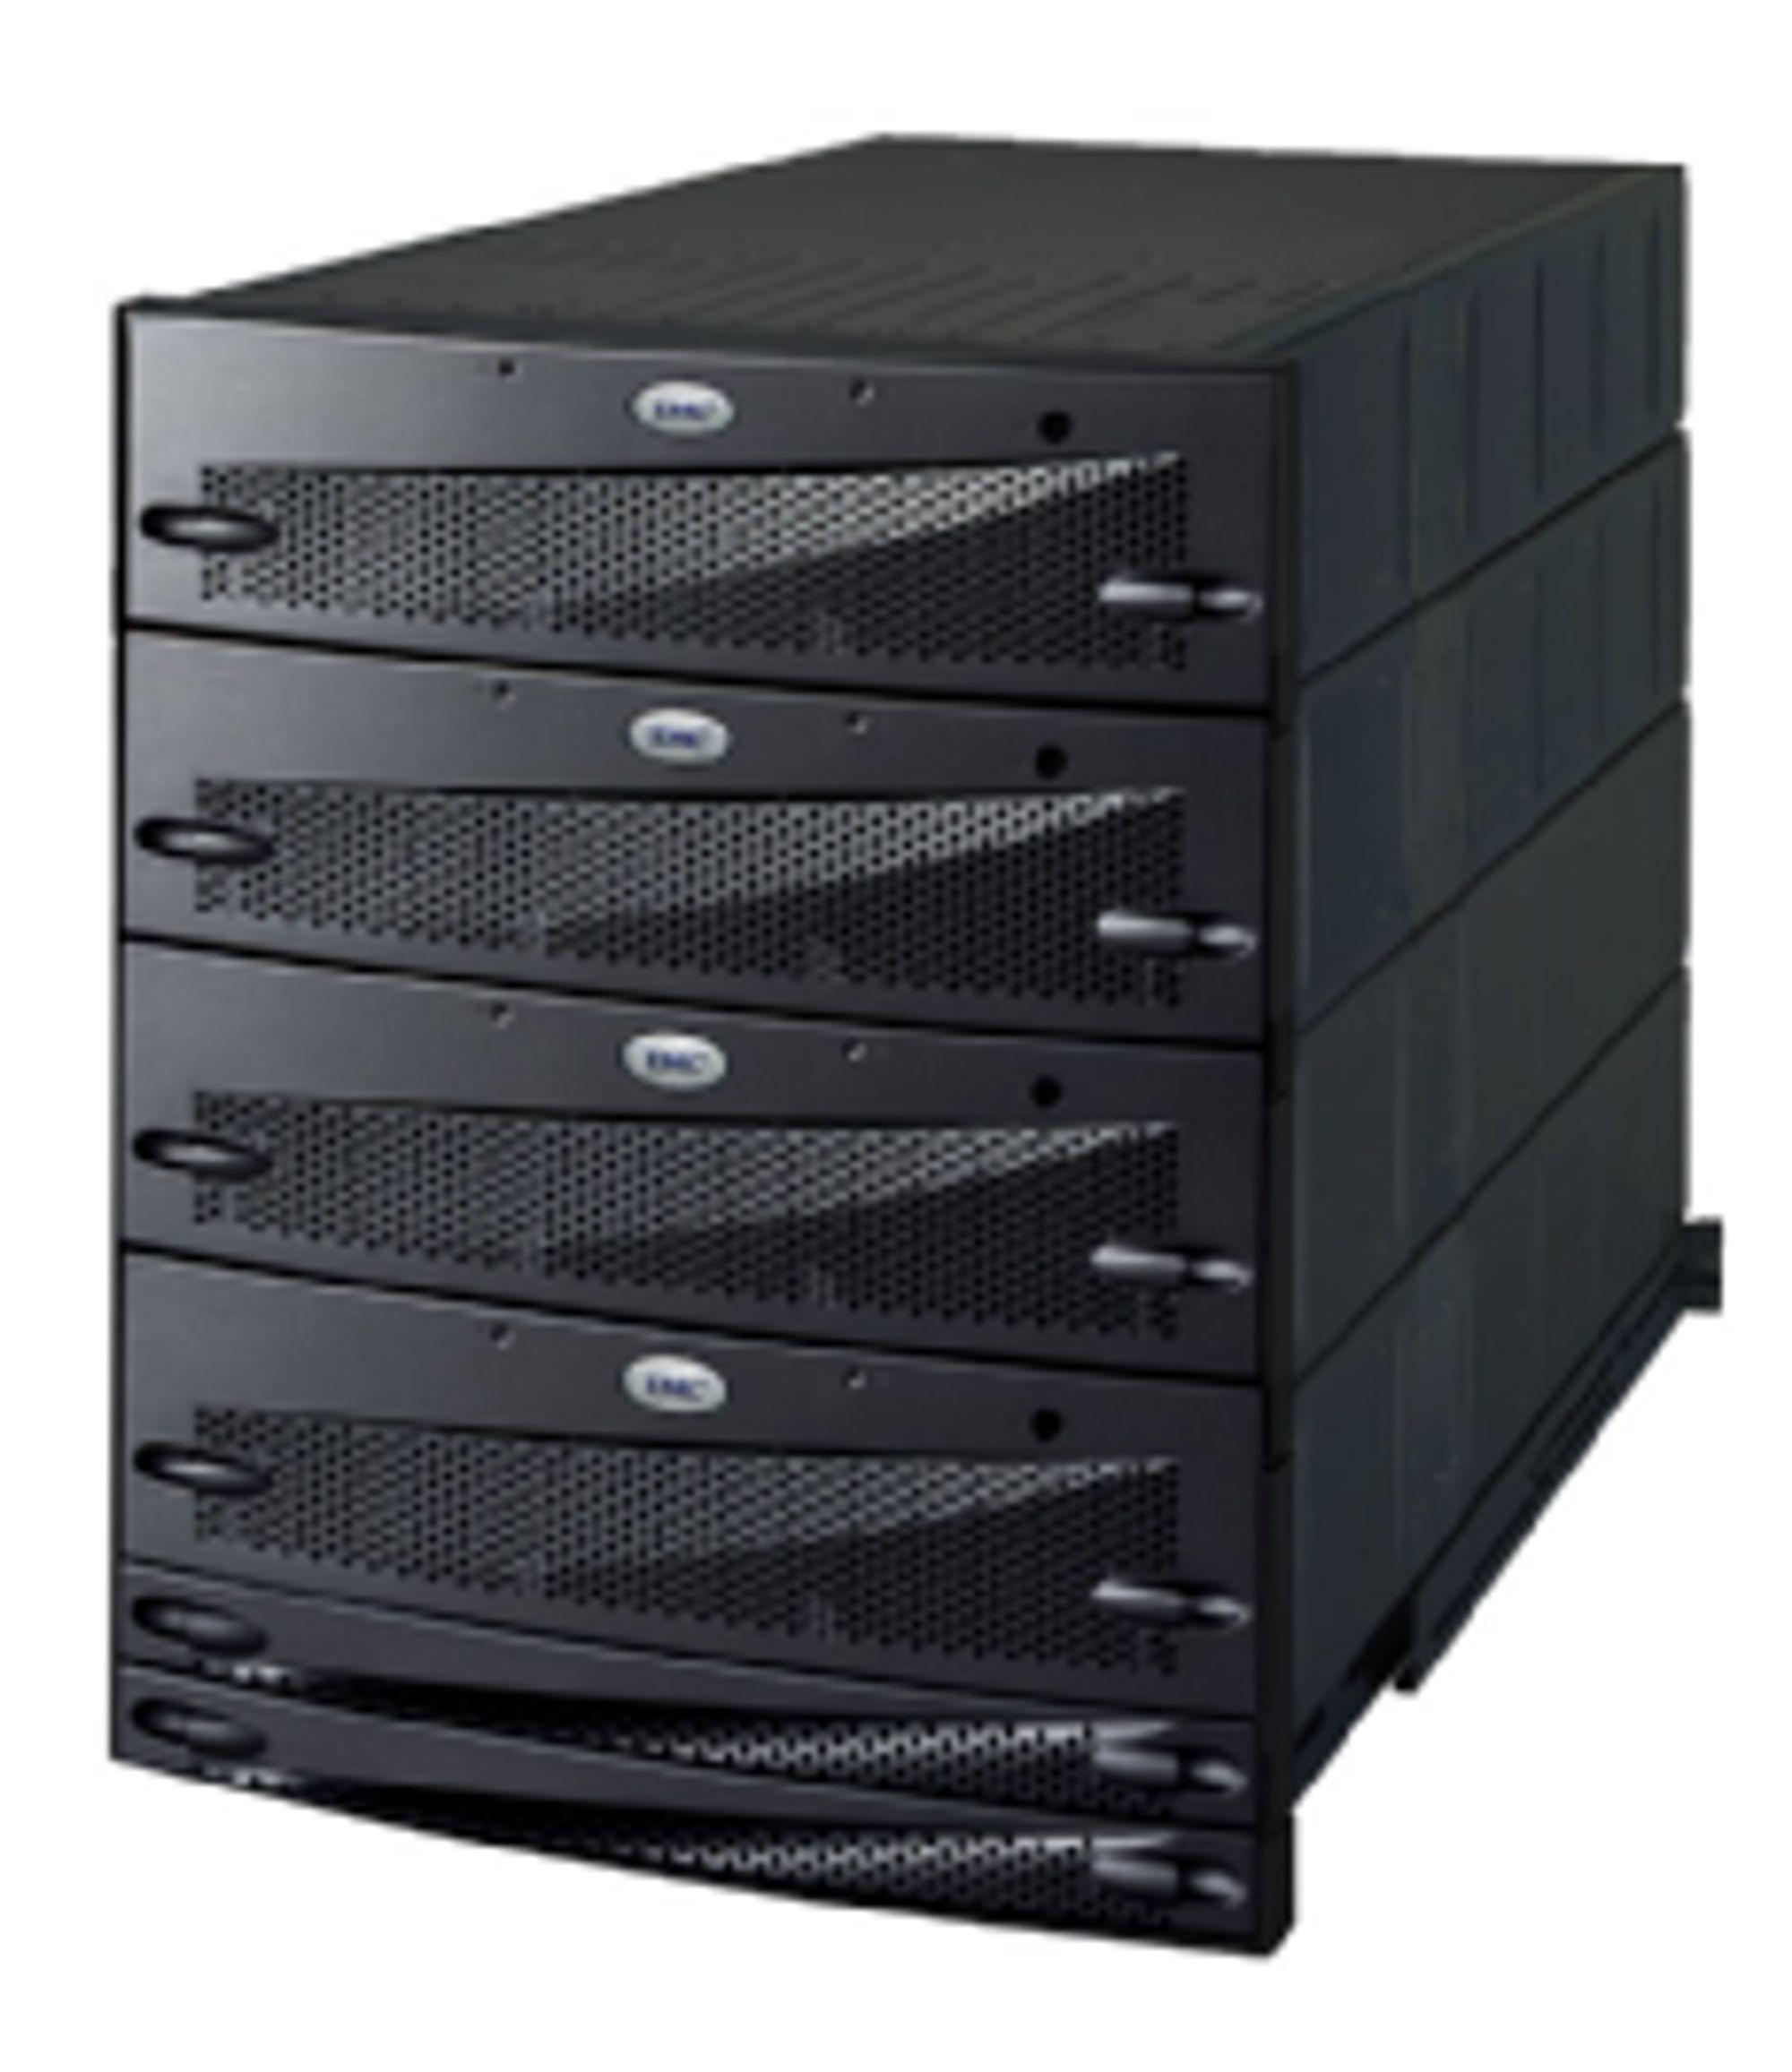 EMC CX3-10 UltraScale